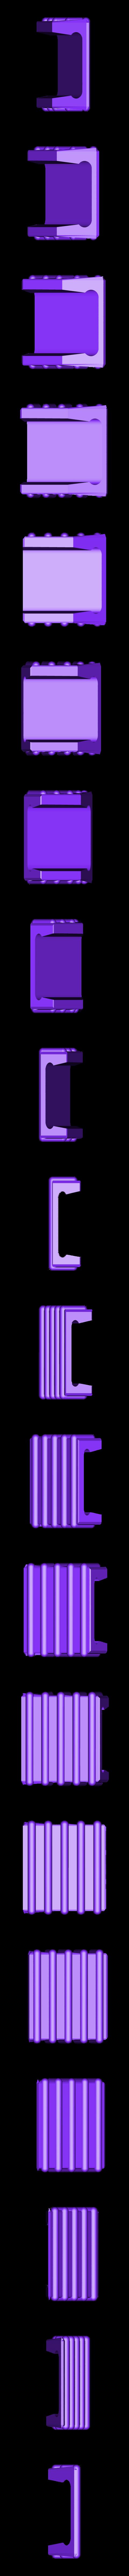 PipBoy-2000_-_HoloTape_-_slider.stl Download free STL file Fallout HoloTape • 3D print object, ka3ros